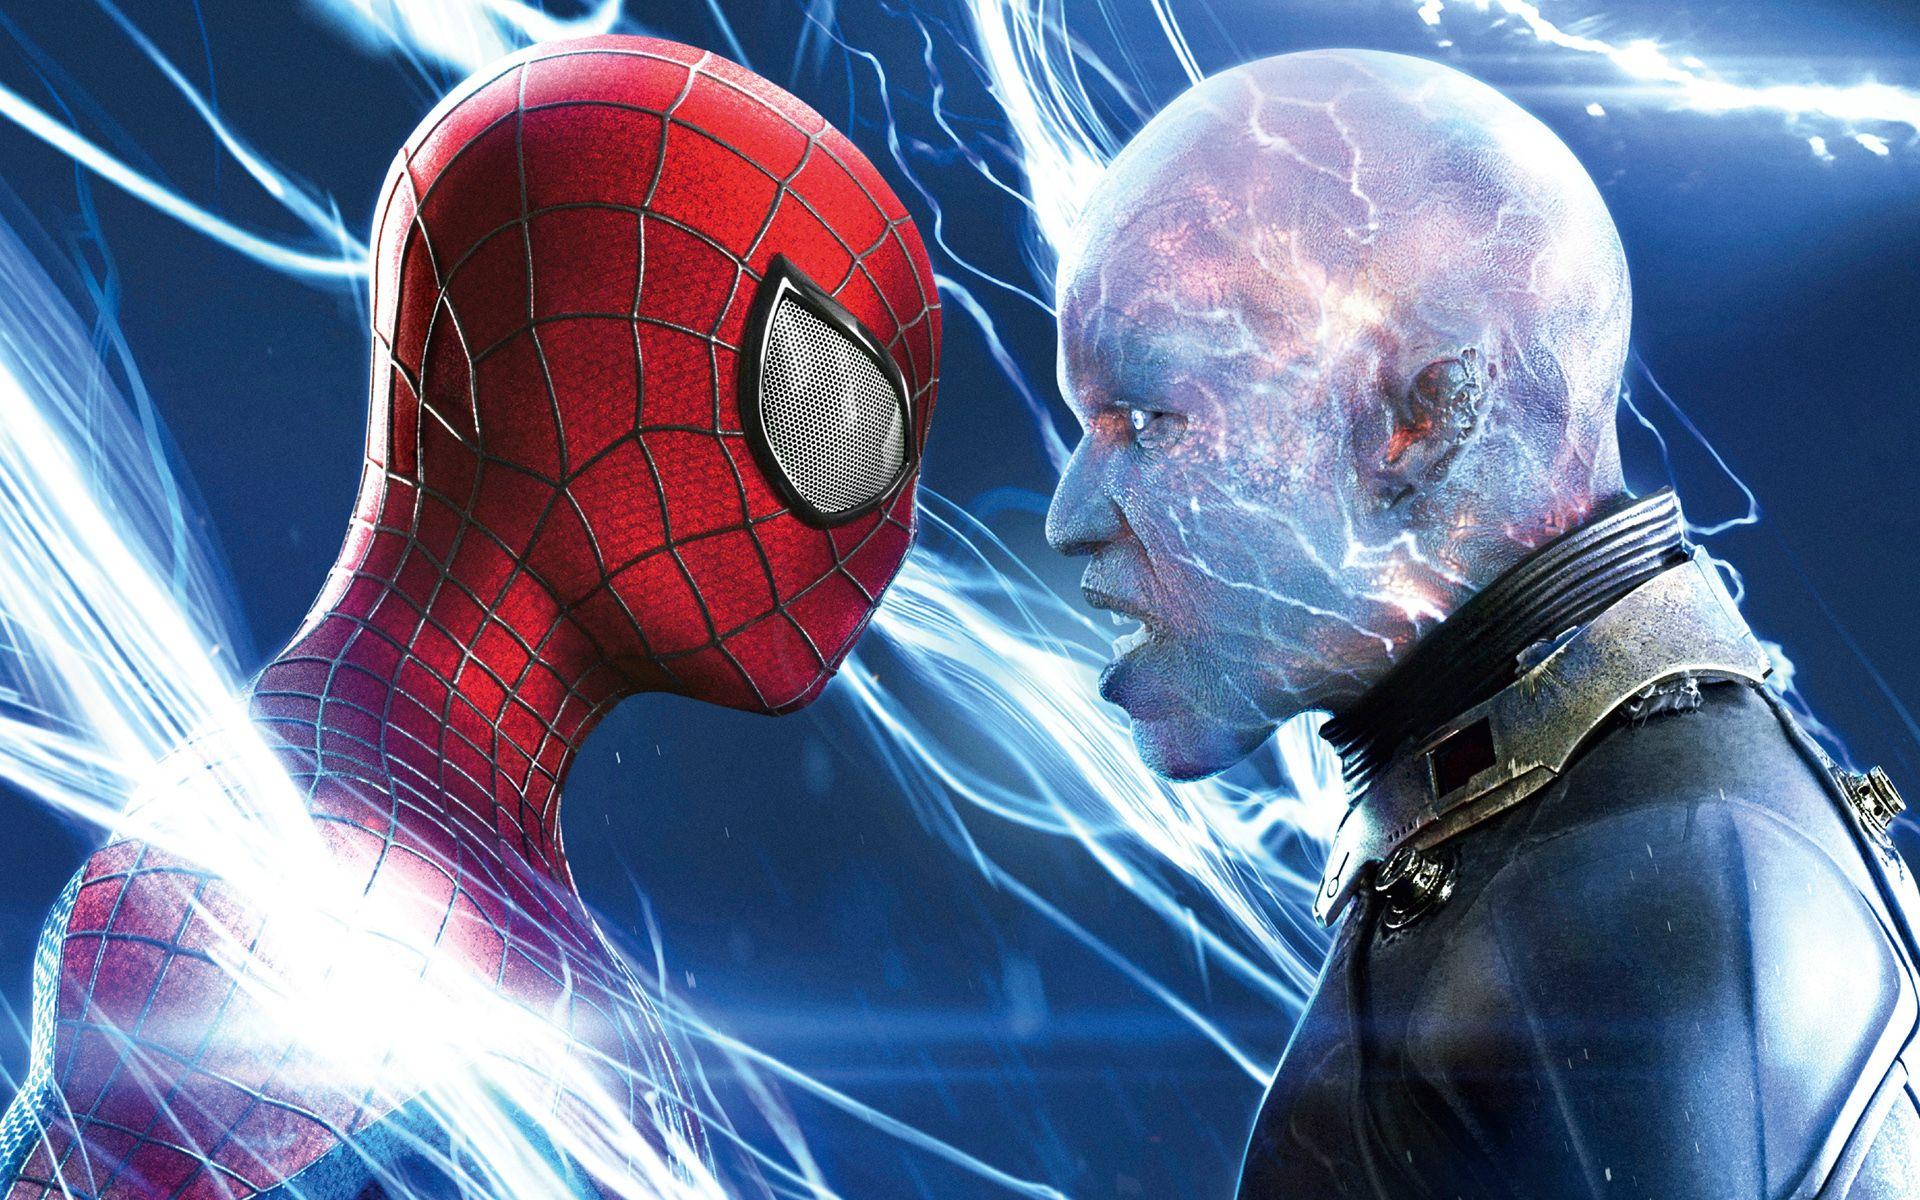 The amazing spider man 2 best fight scenes hd spiderman vs electro fight scenes the amazing spider man 2 also released as the amazing spider m